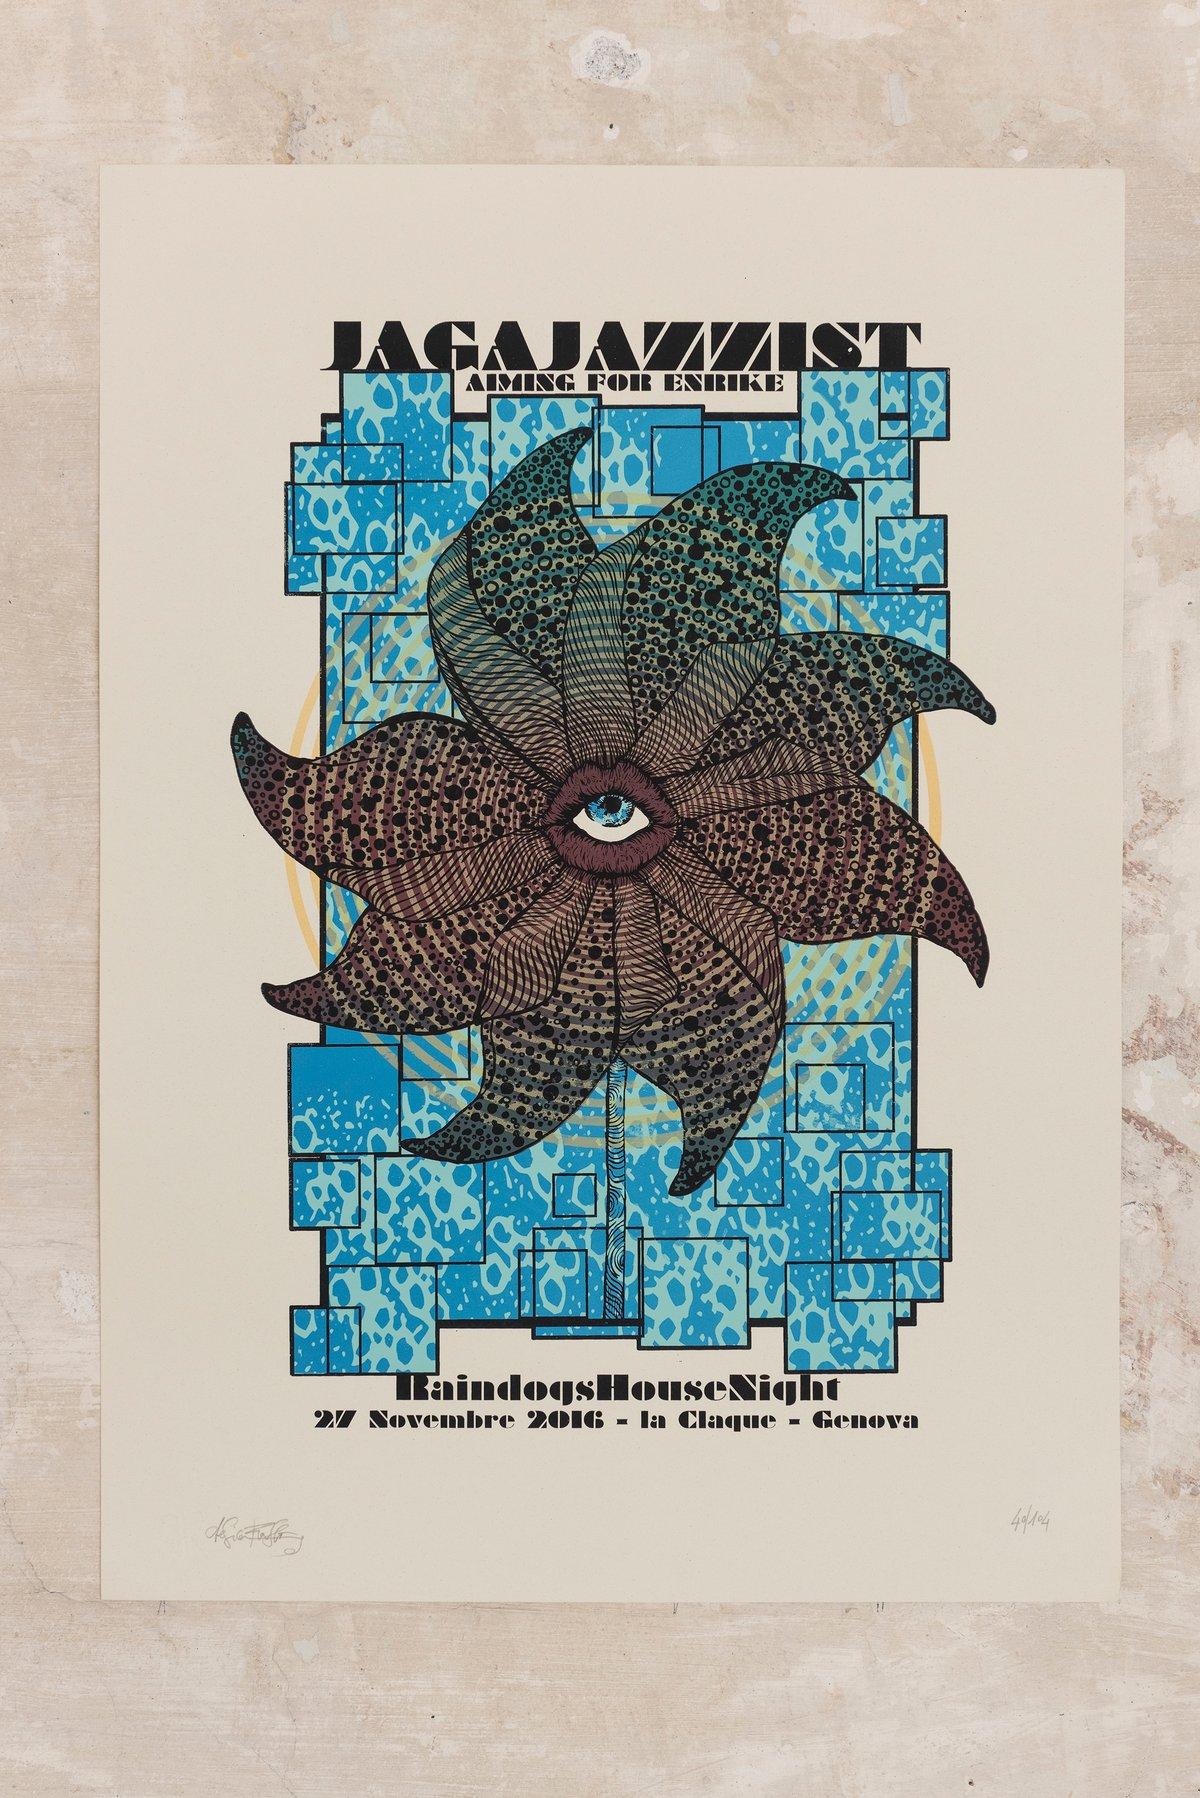 Image of JAGAJAZZIST - AIMING FOR ENRIKE